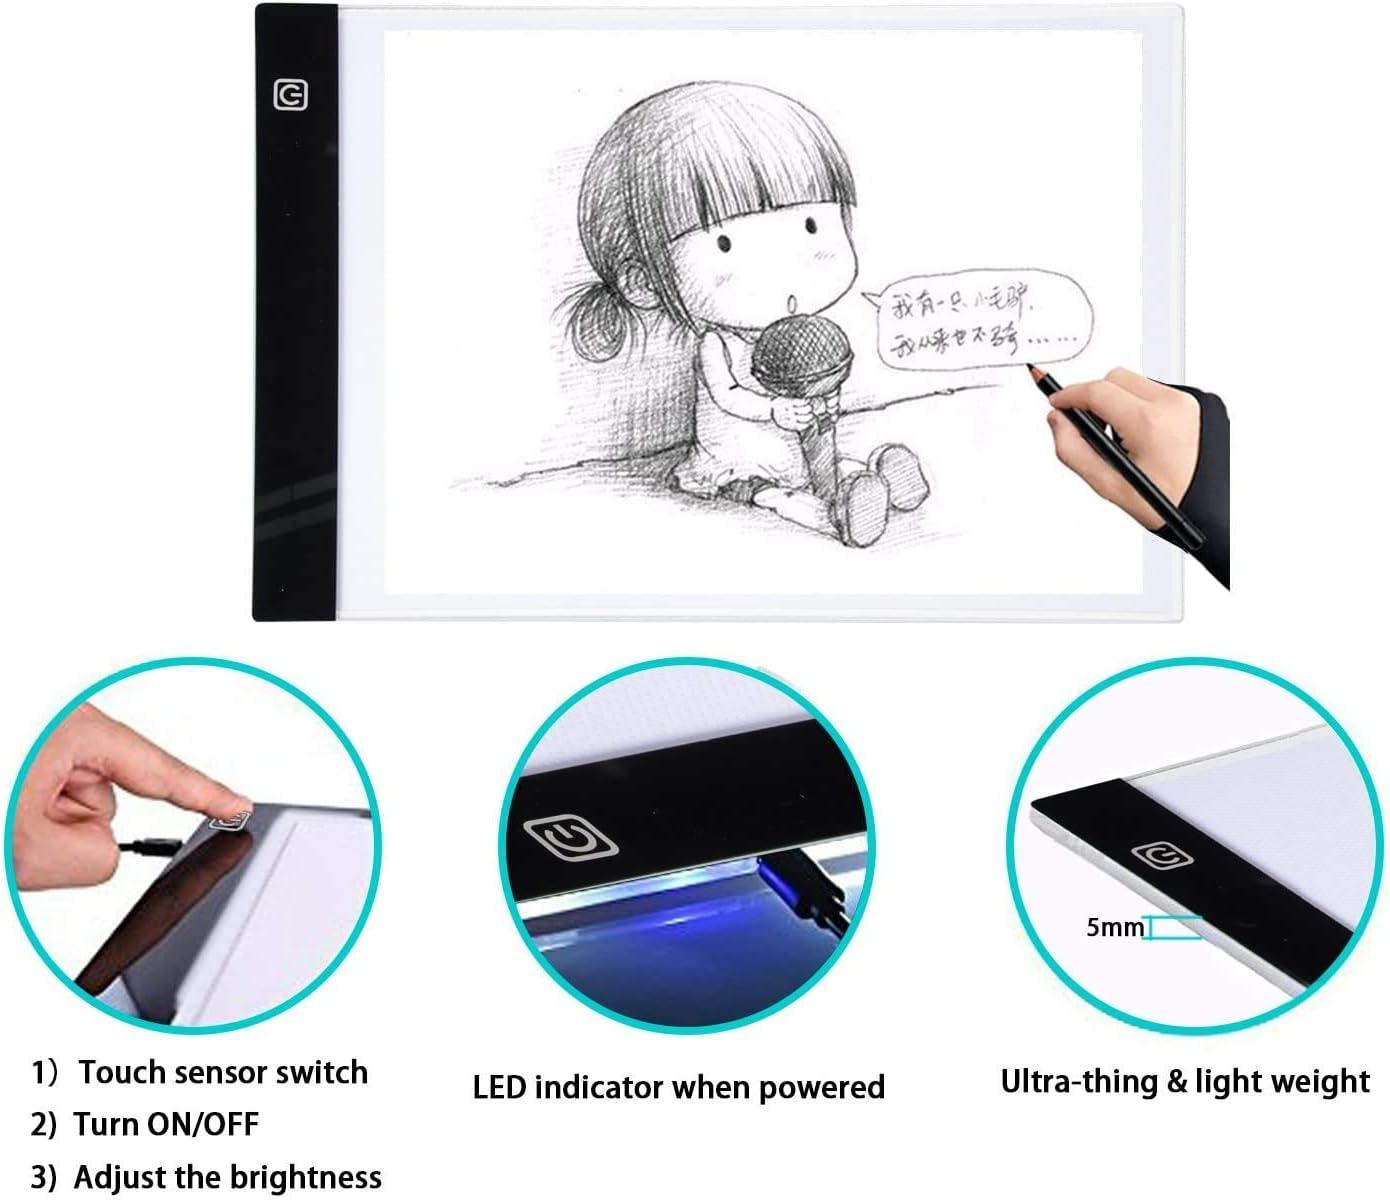 220 V A3 enchufe de la UE dise/ño Stencil Drawing Thin Pad Copy Lightbox tabla de dibujo con LED Caja de luz de artista